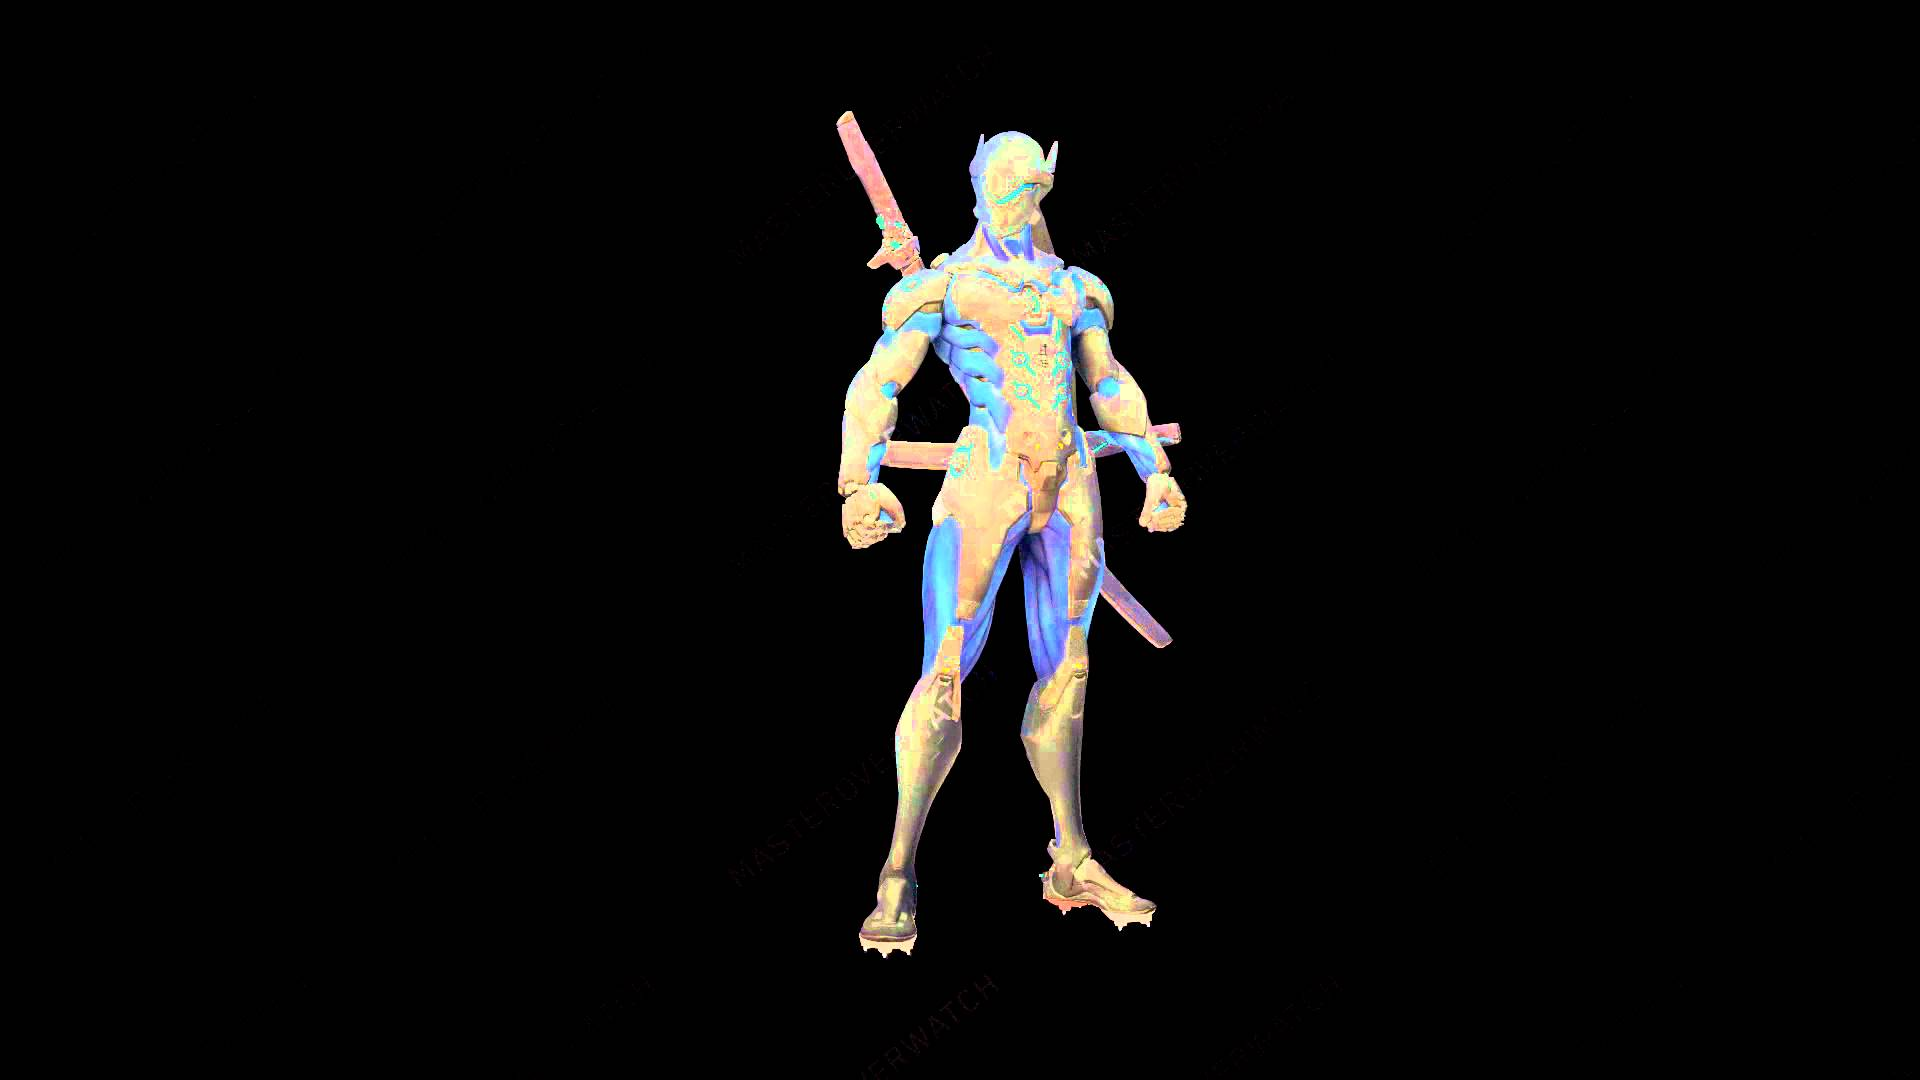 HD Carbon Fiber Genji Overwatch Skin 1920x1080